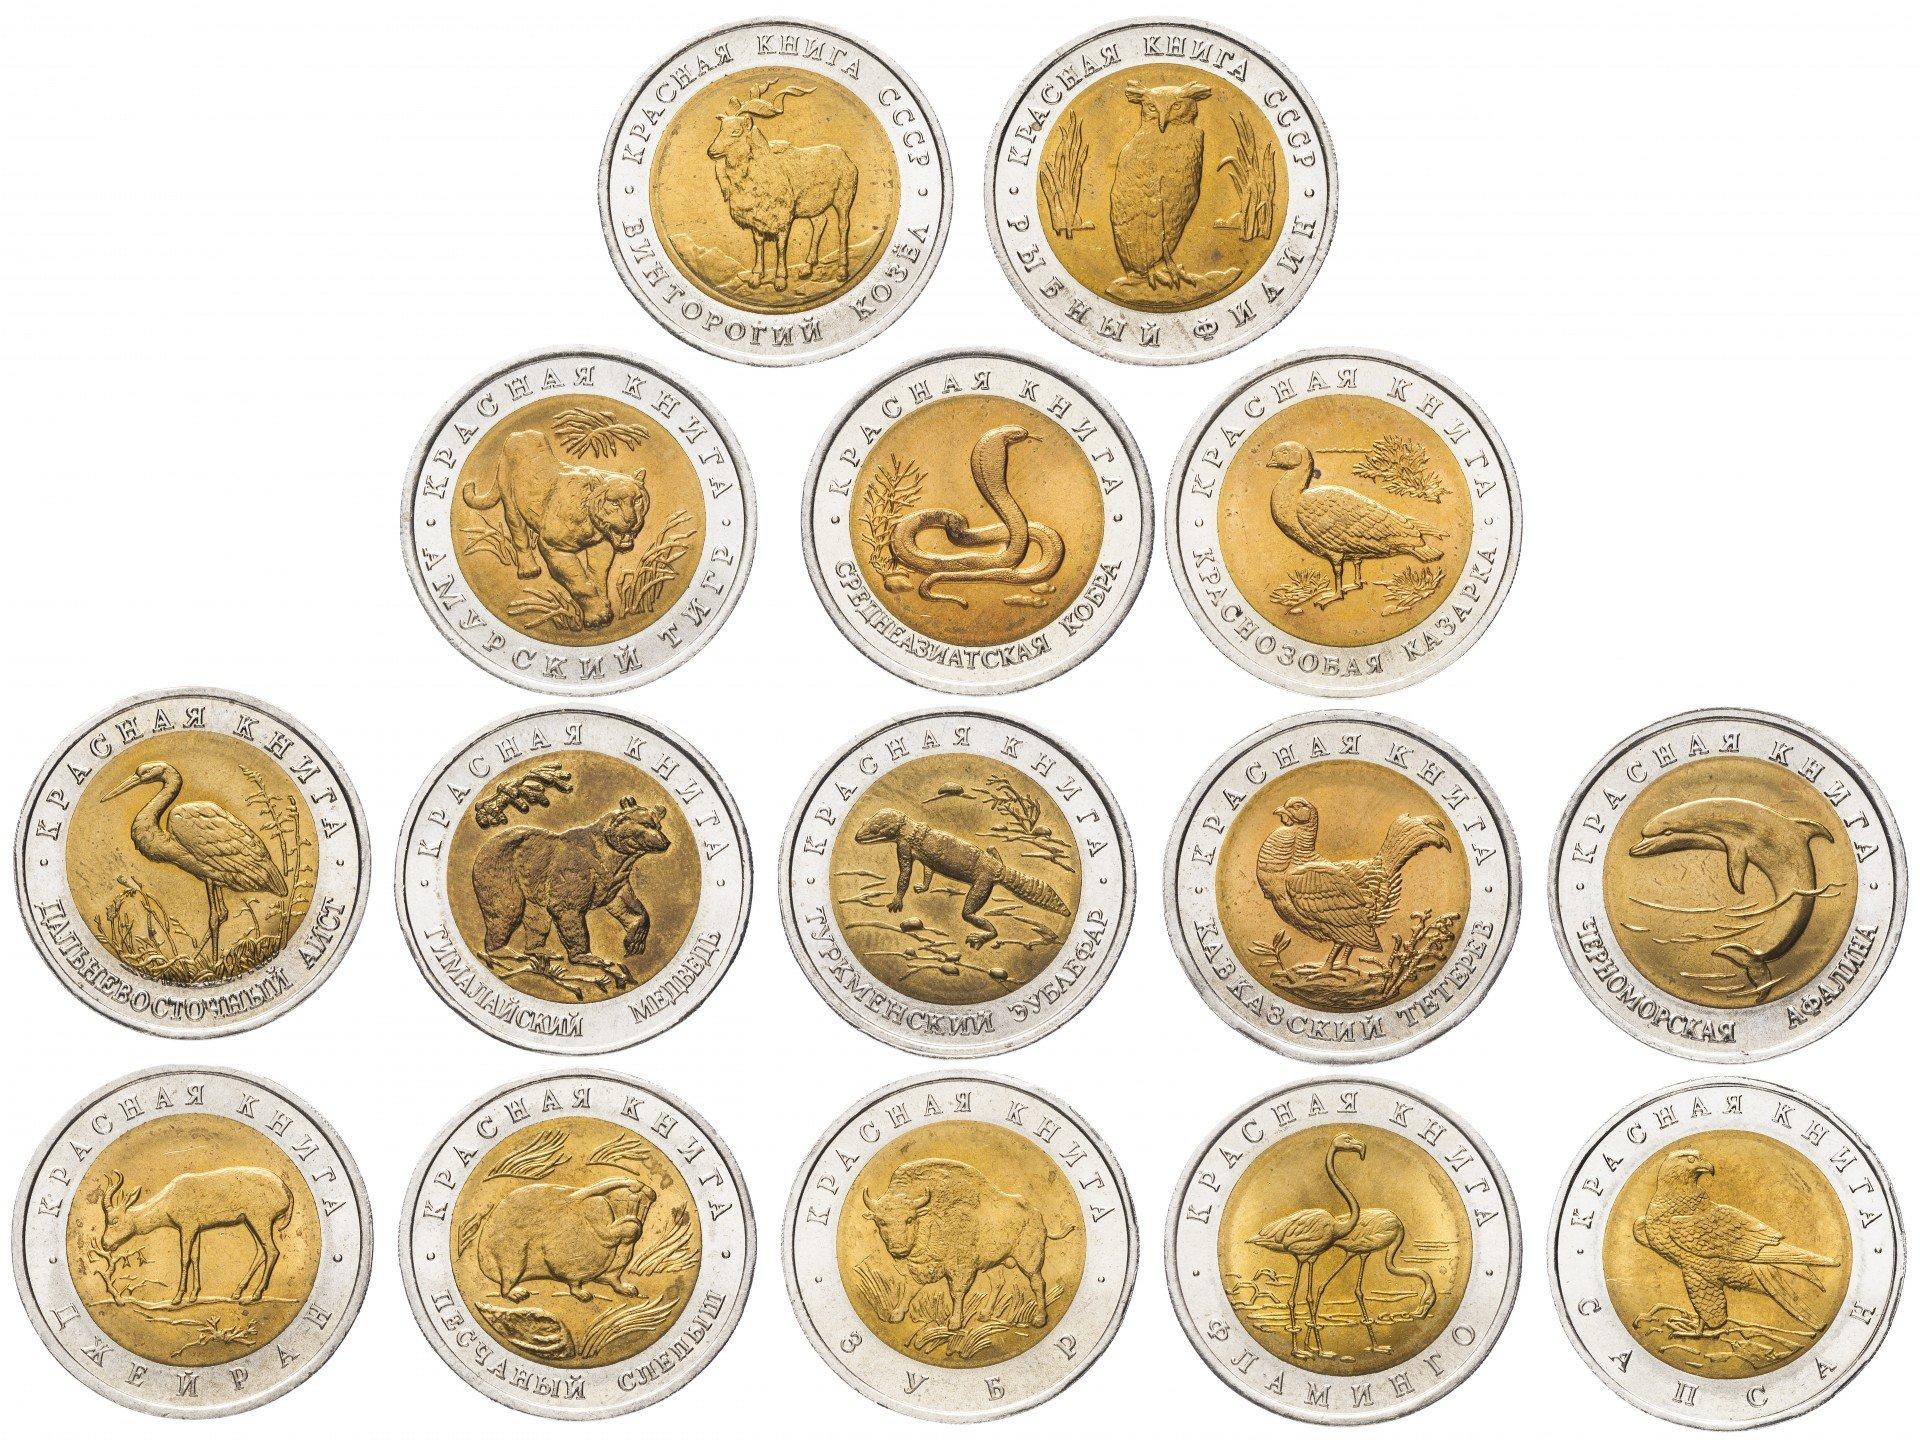 Набор красная книга цена 15 монет колонии португалии список